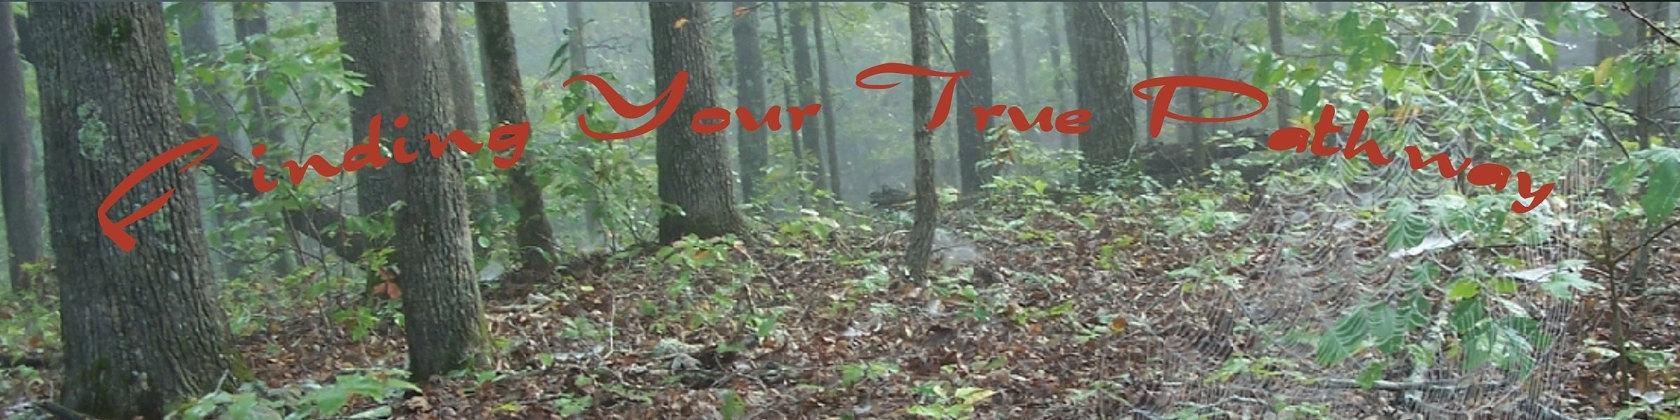 True Charon (@truecharon) Cover Image